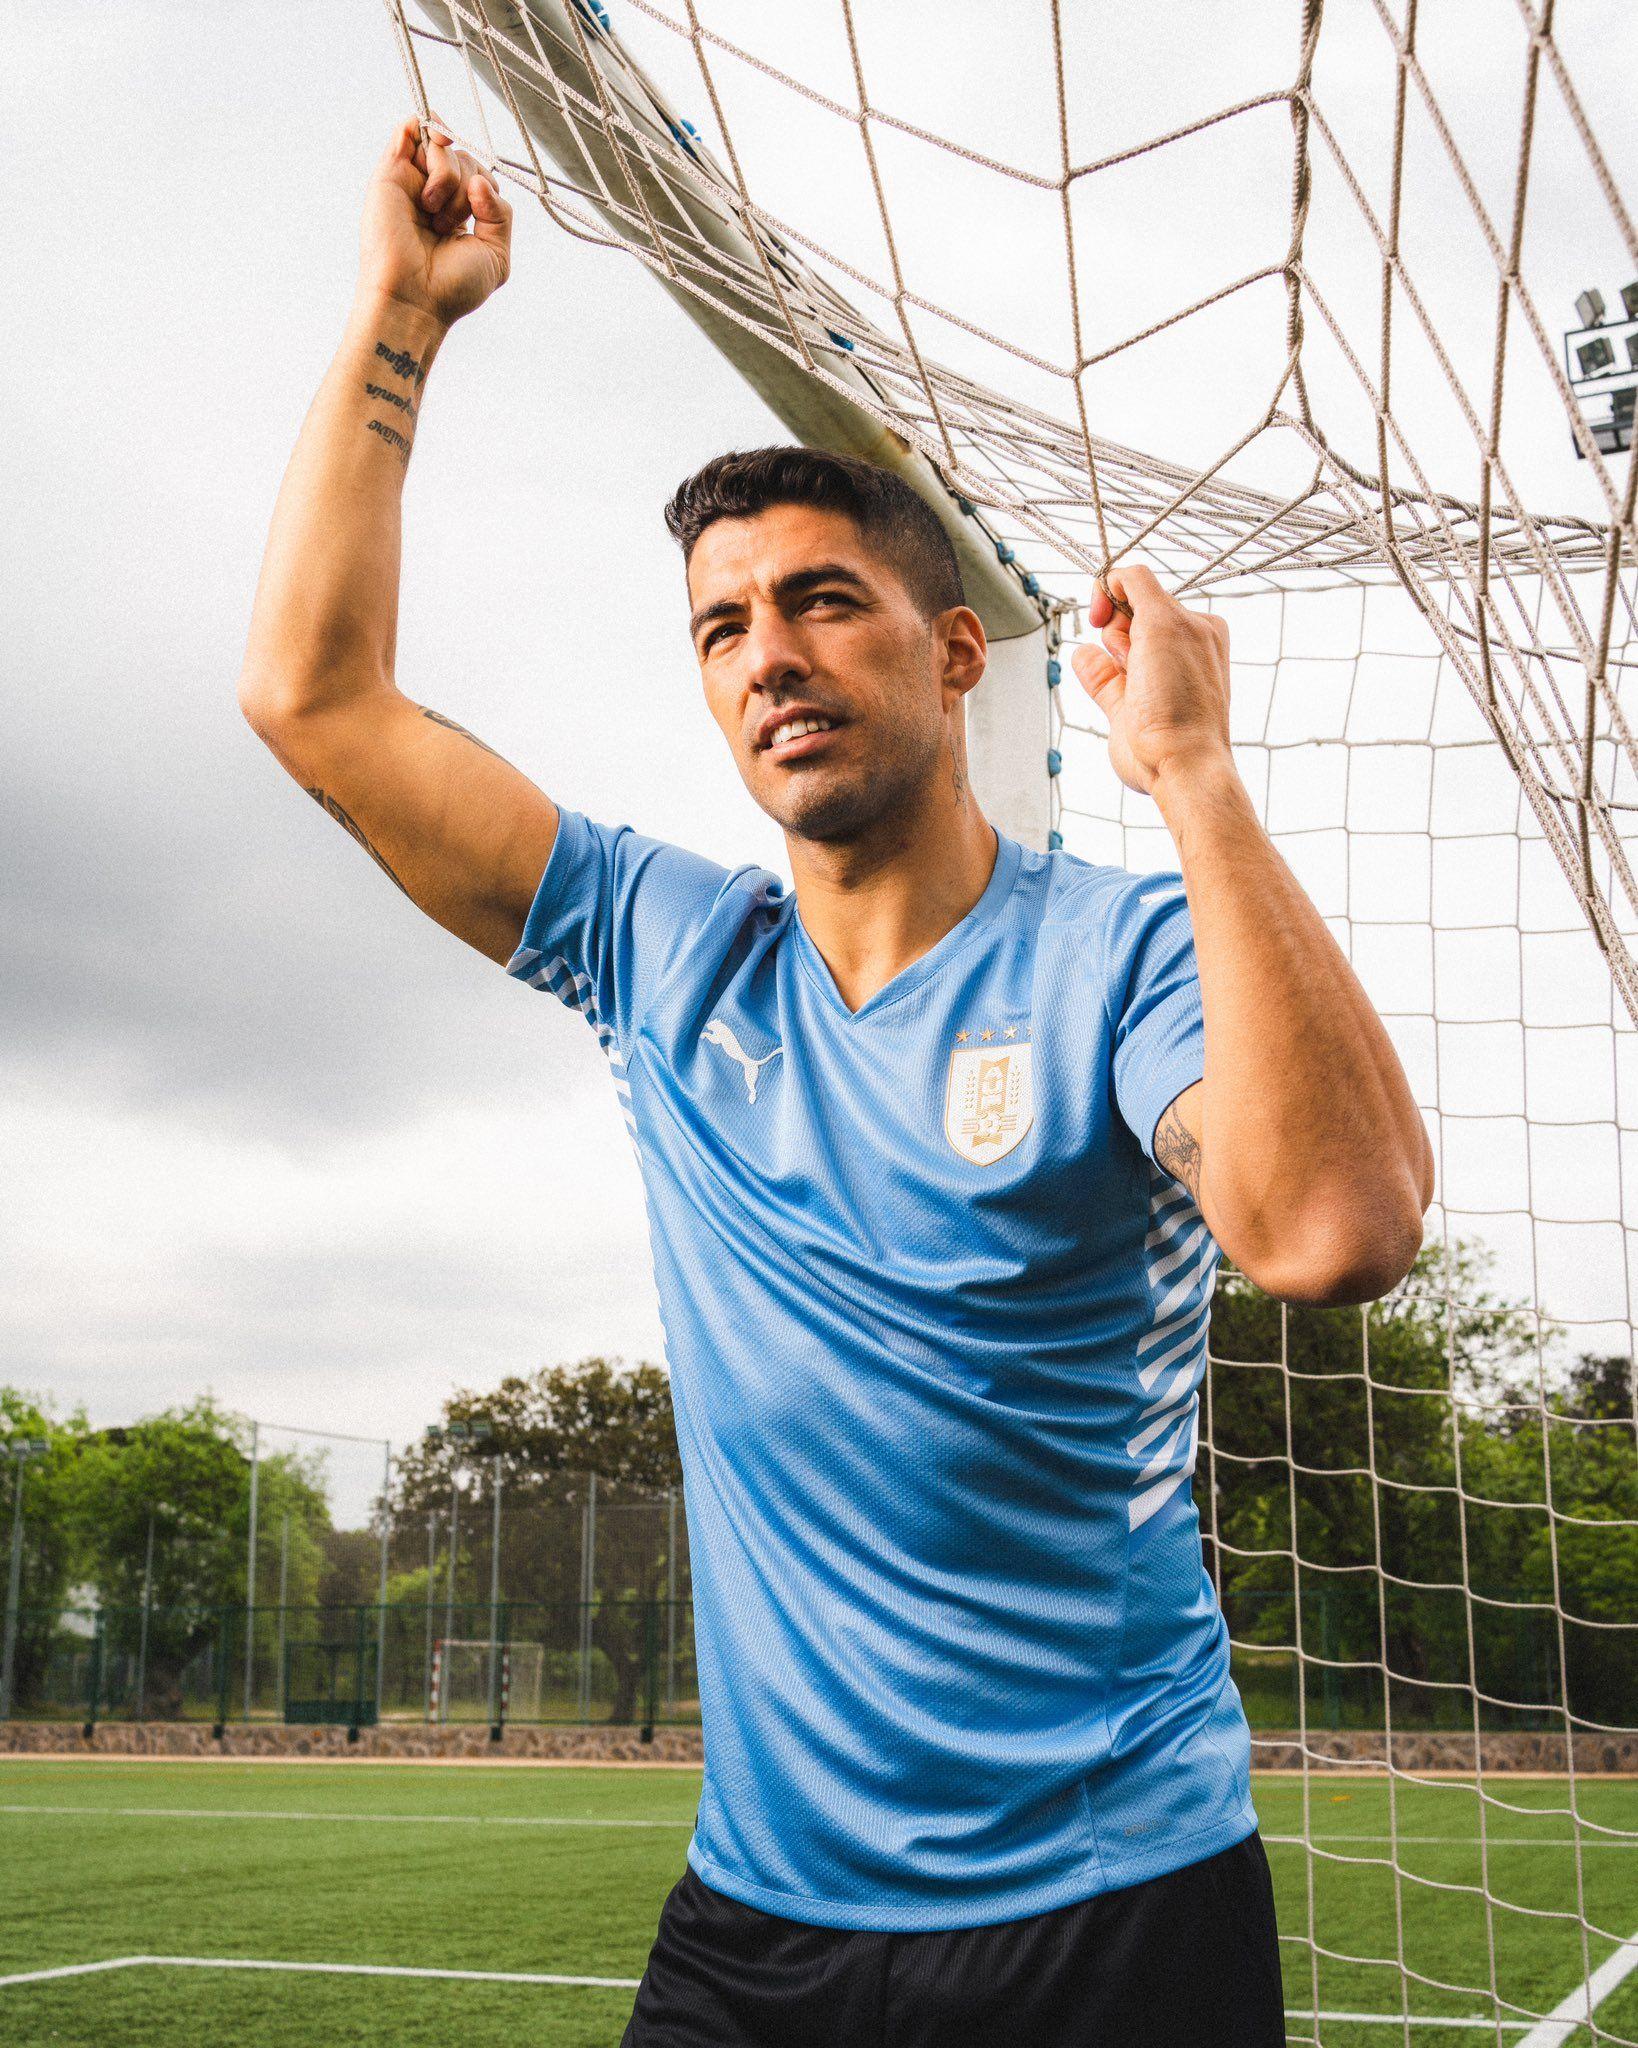 Camiseta titular Puma de Uruguay Copa América 2021 | Imagen Instagram Luis Suárez